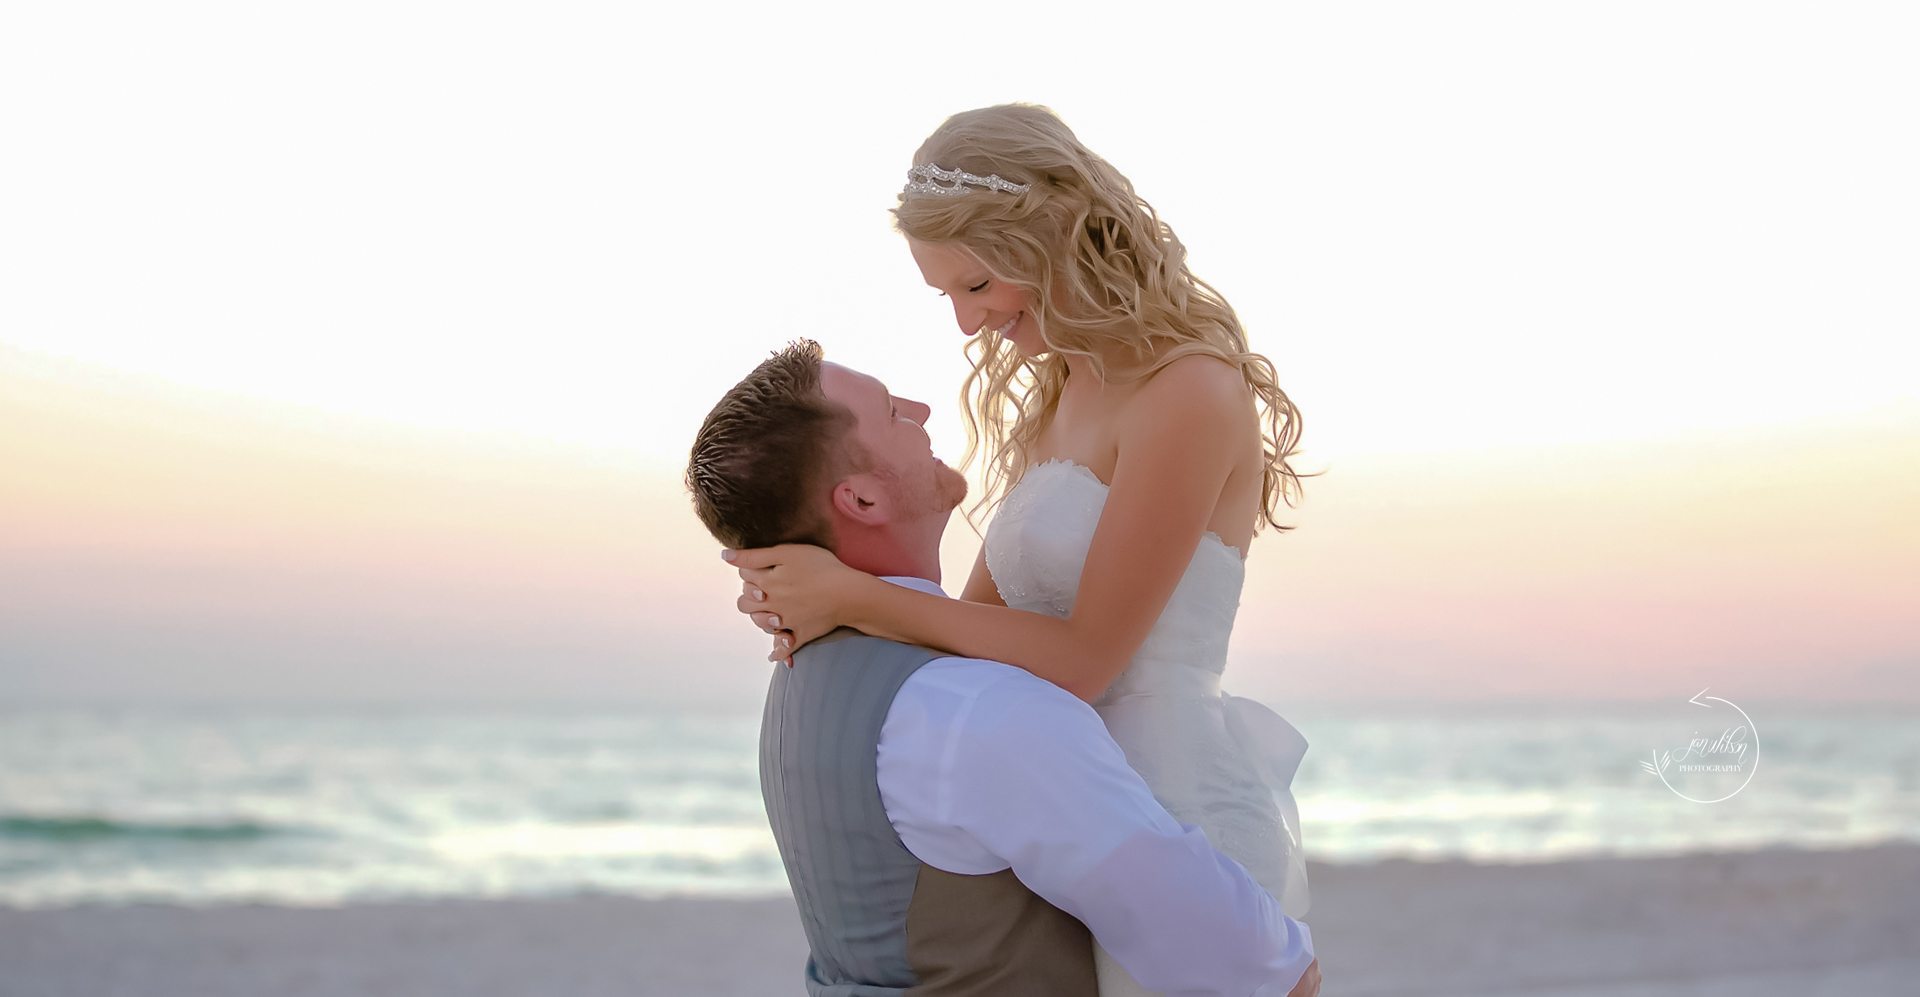 Wedding Photography Panama City Beach: Jan Wilson Photography Panama City Beach